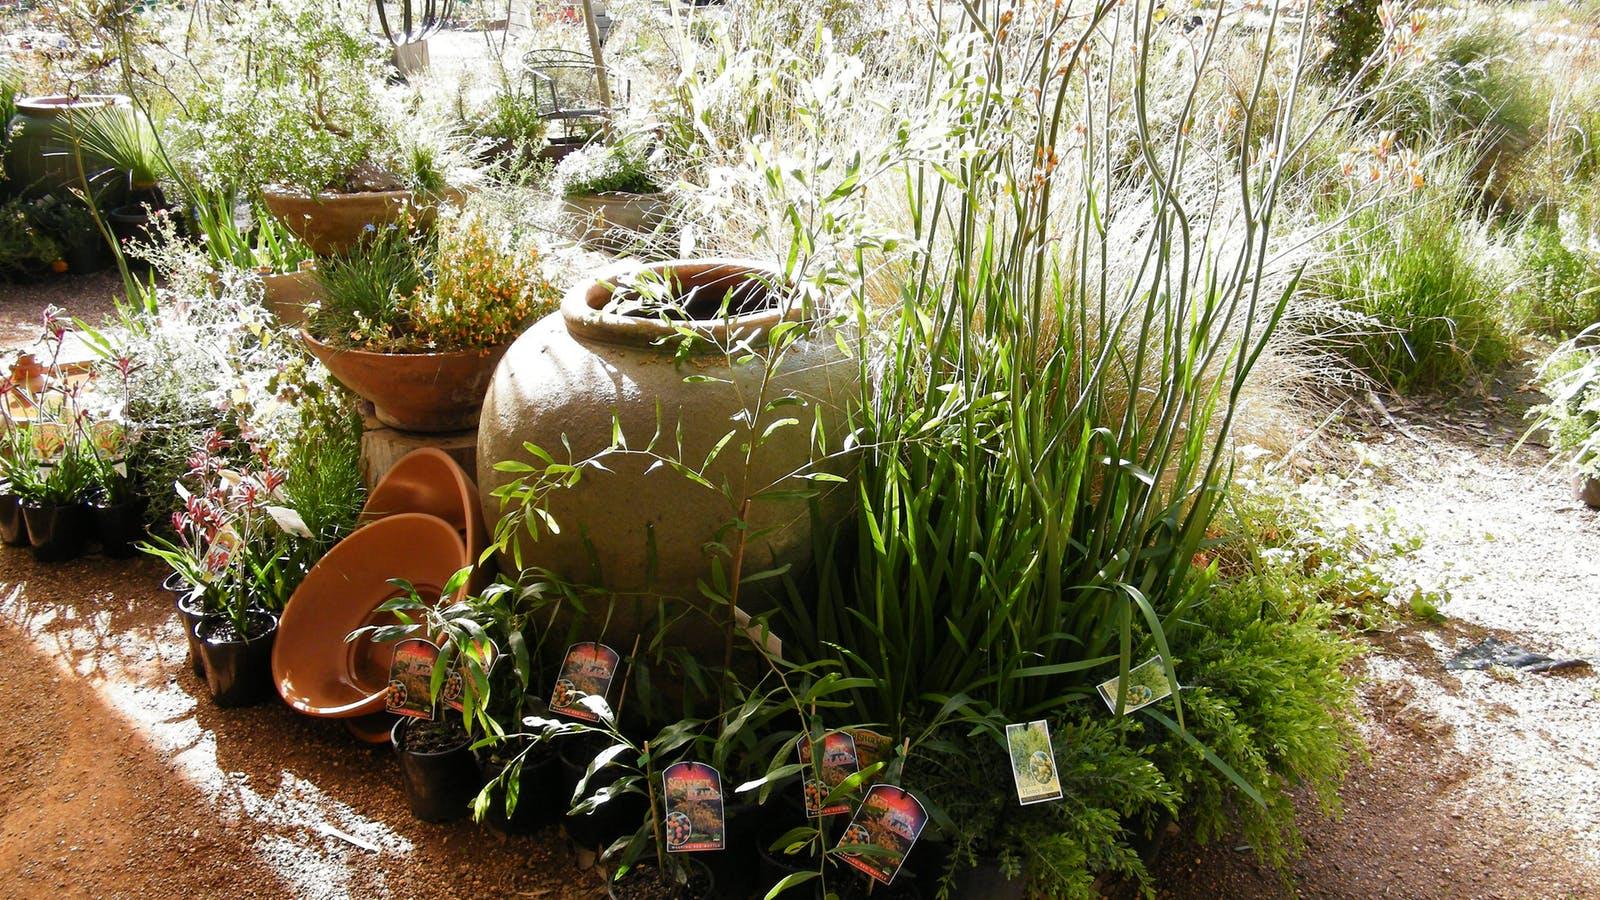 Display of native plants